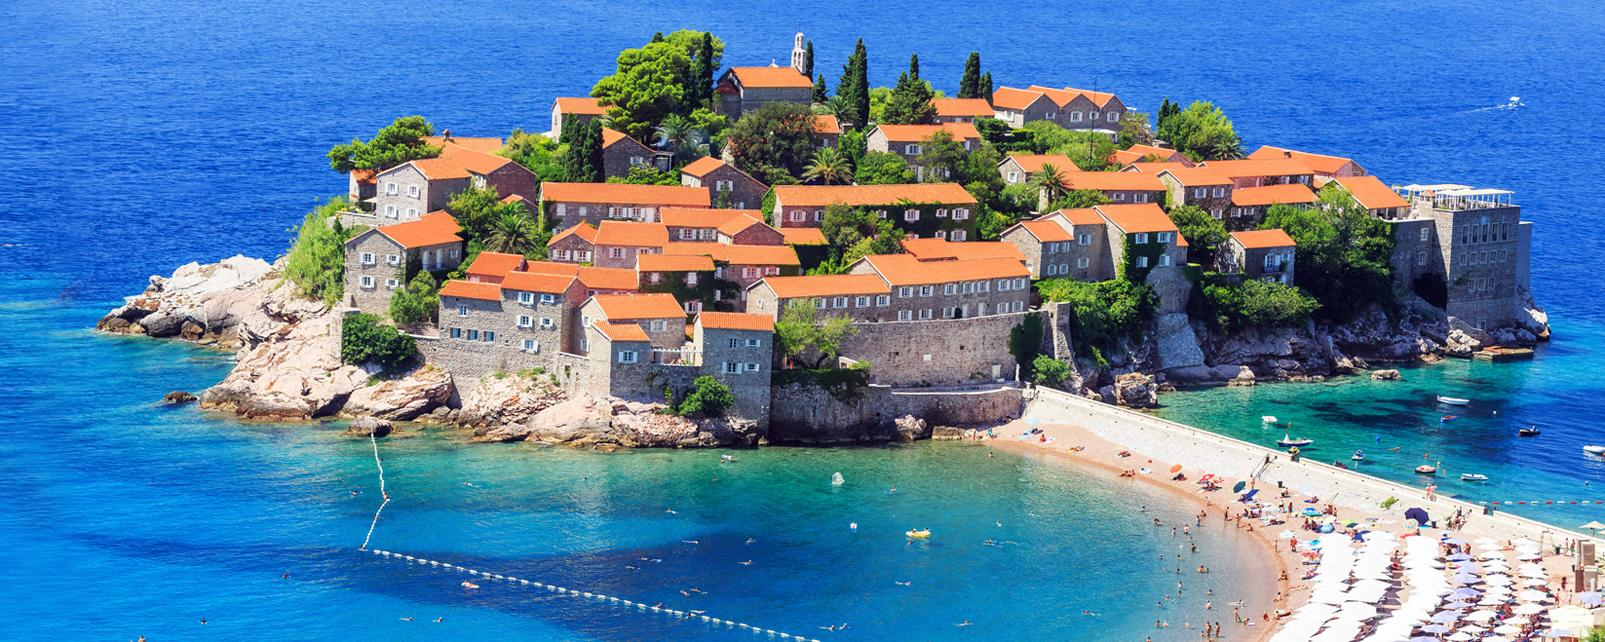 vacances au montenegro Monténégro